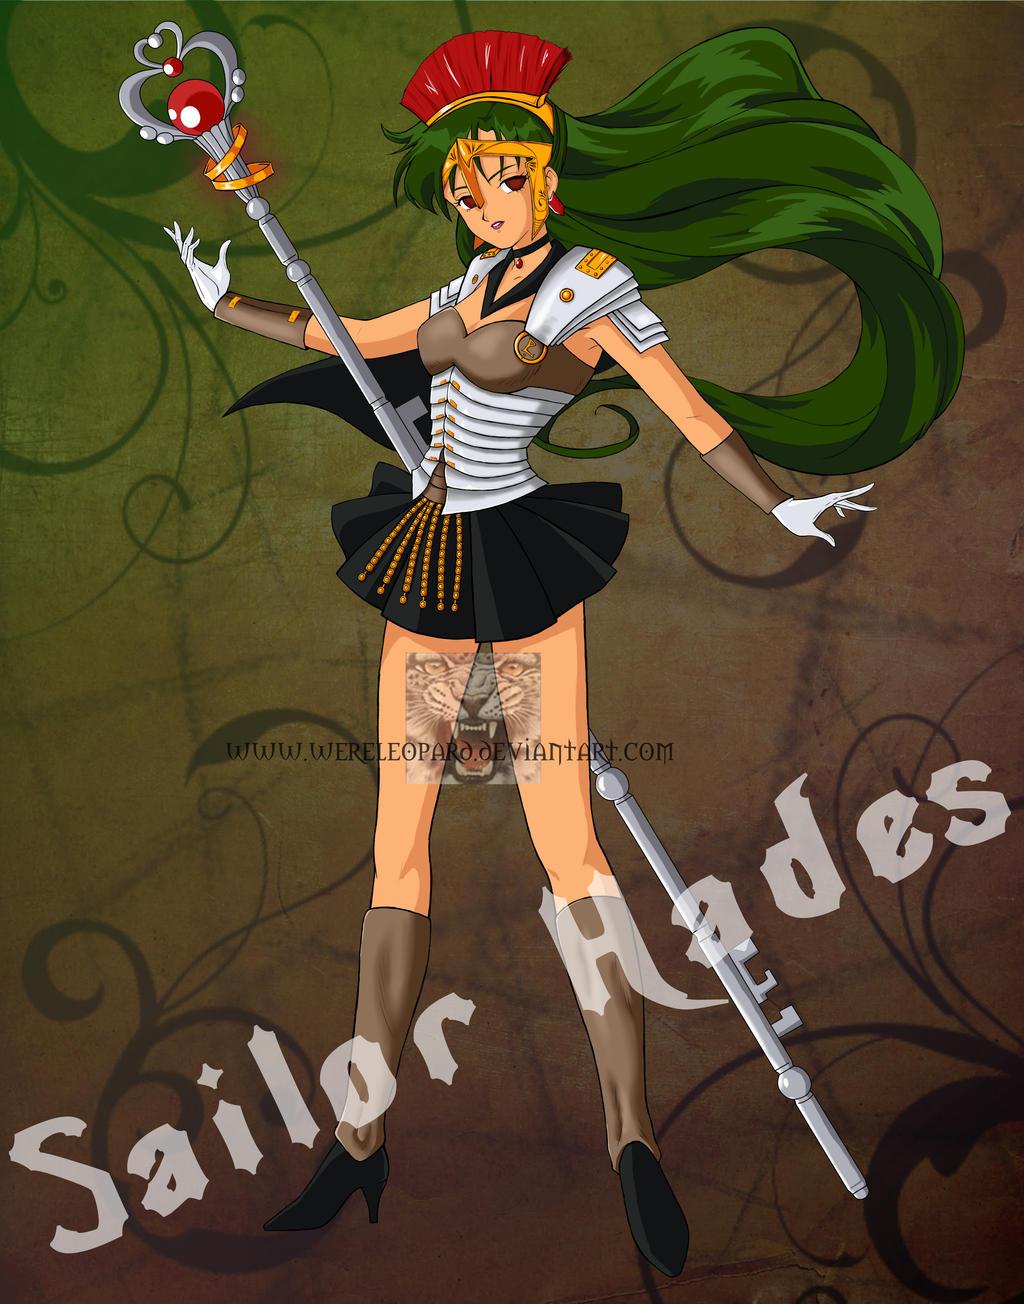 http://img13.deviantart.net/51dd/i/2011/098/7/3/sailor___hades___pluto_by_wereleopard-d3didws.jpg